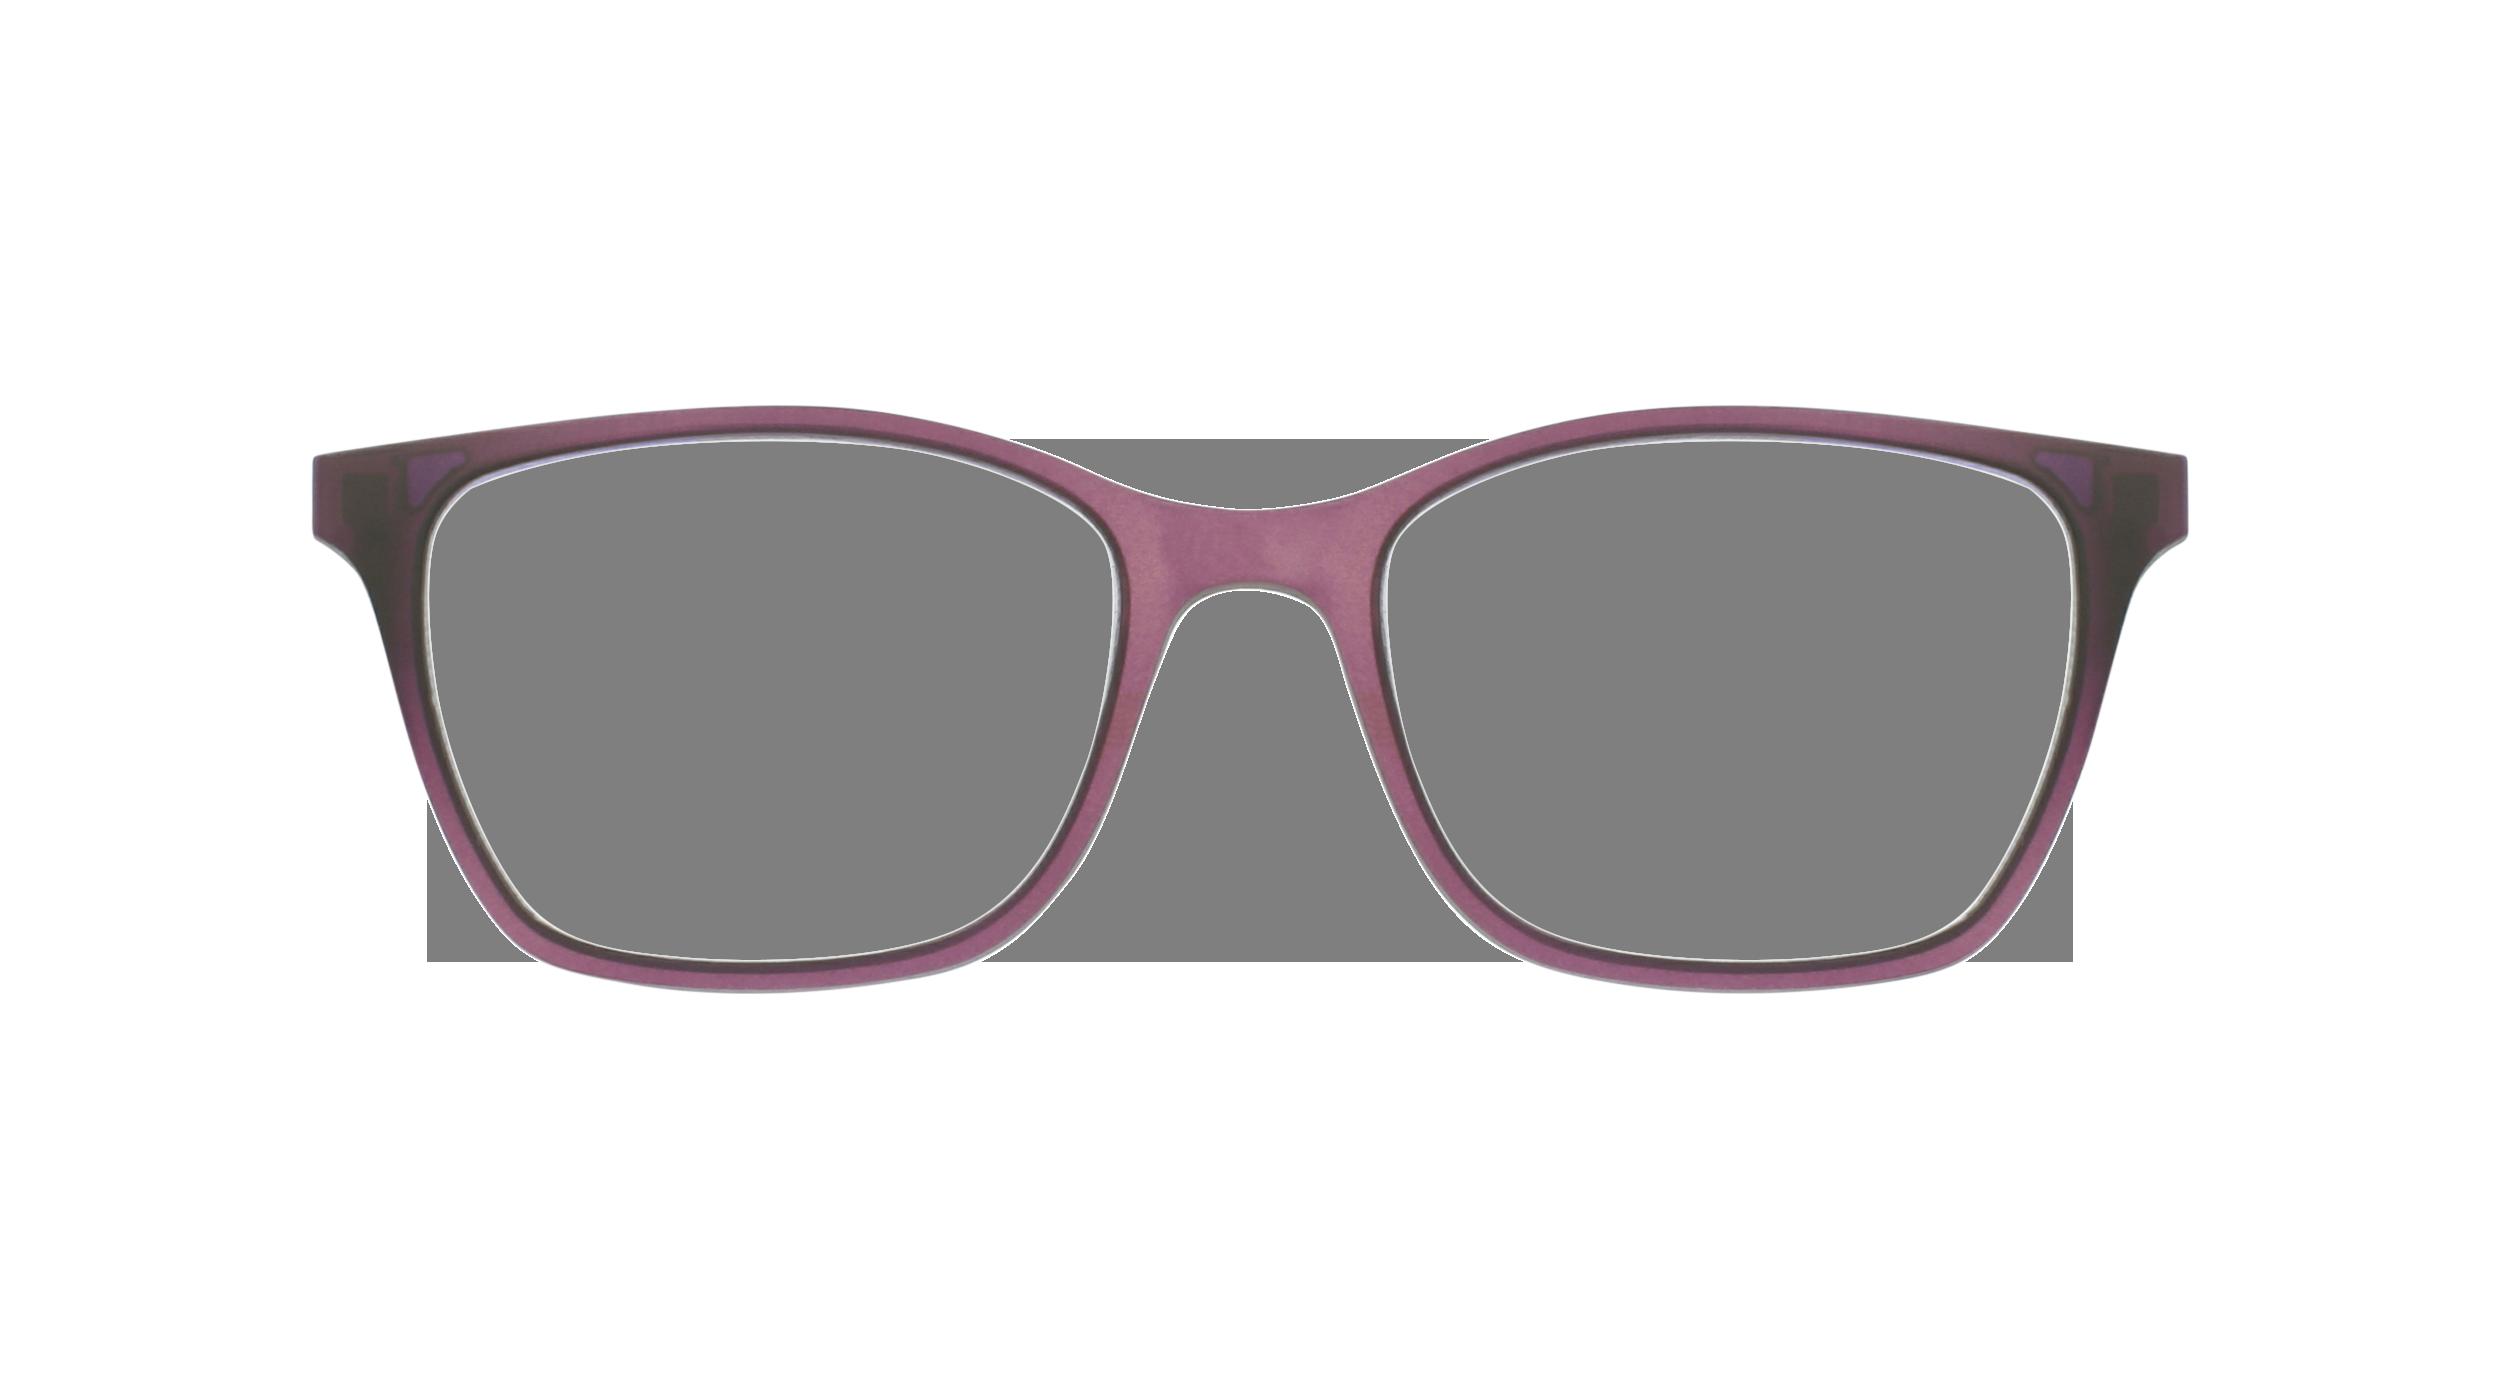 afflelou/france/products/smart_clip/clips_glasses/07630036457603.png